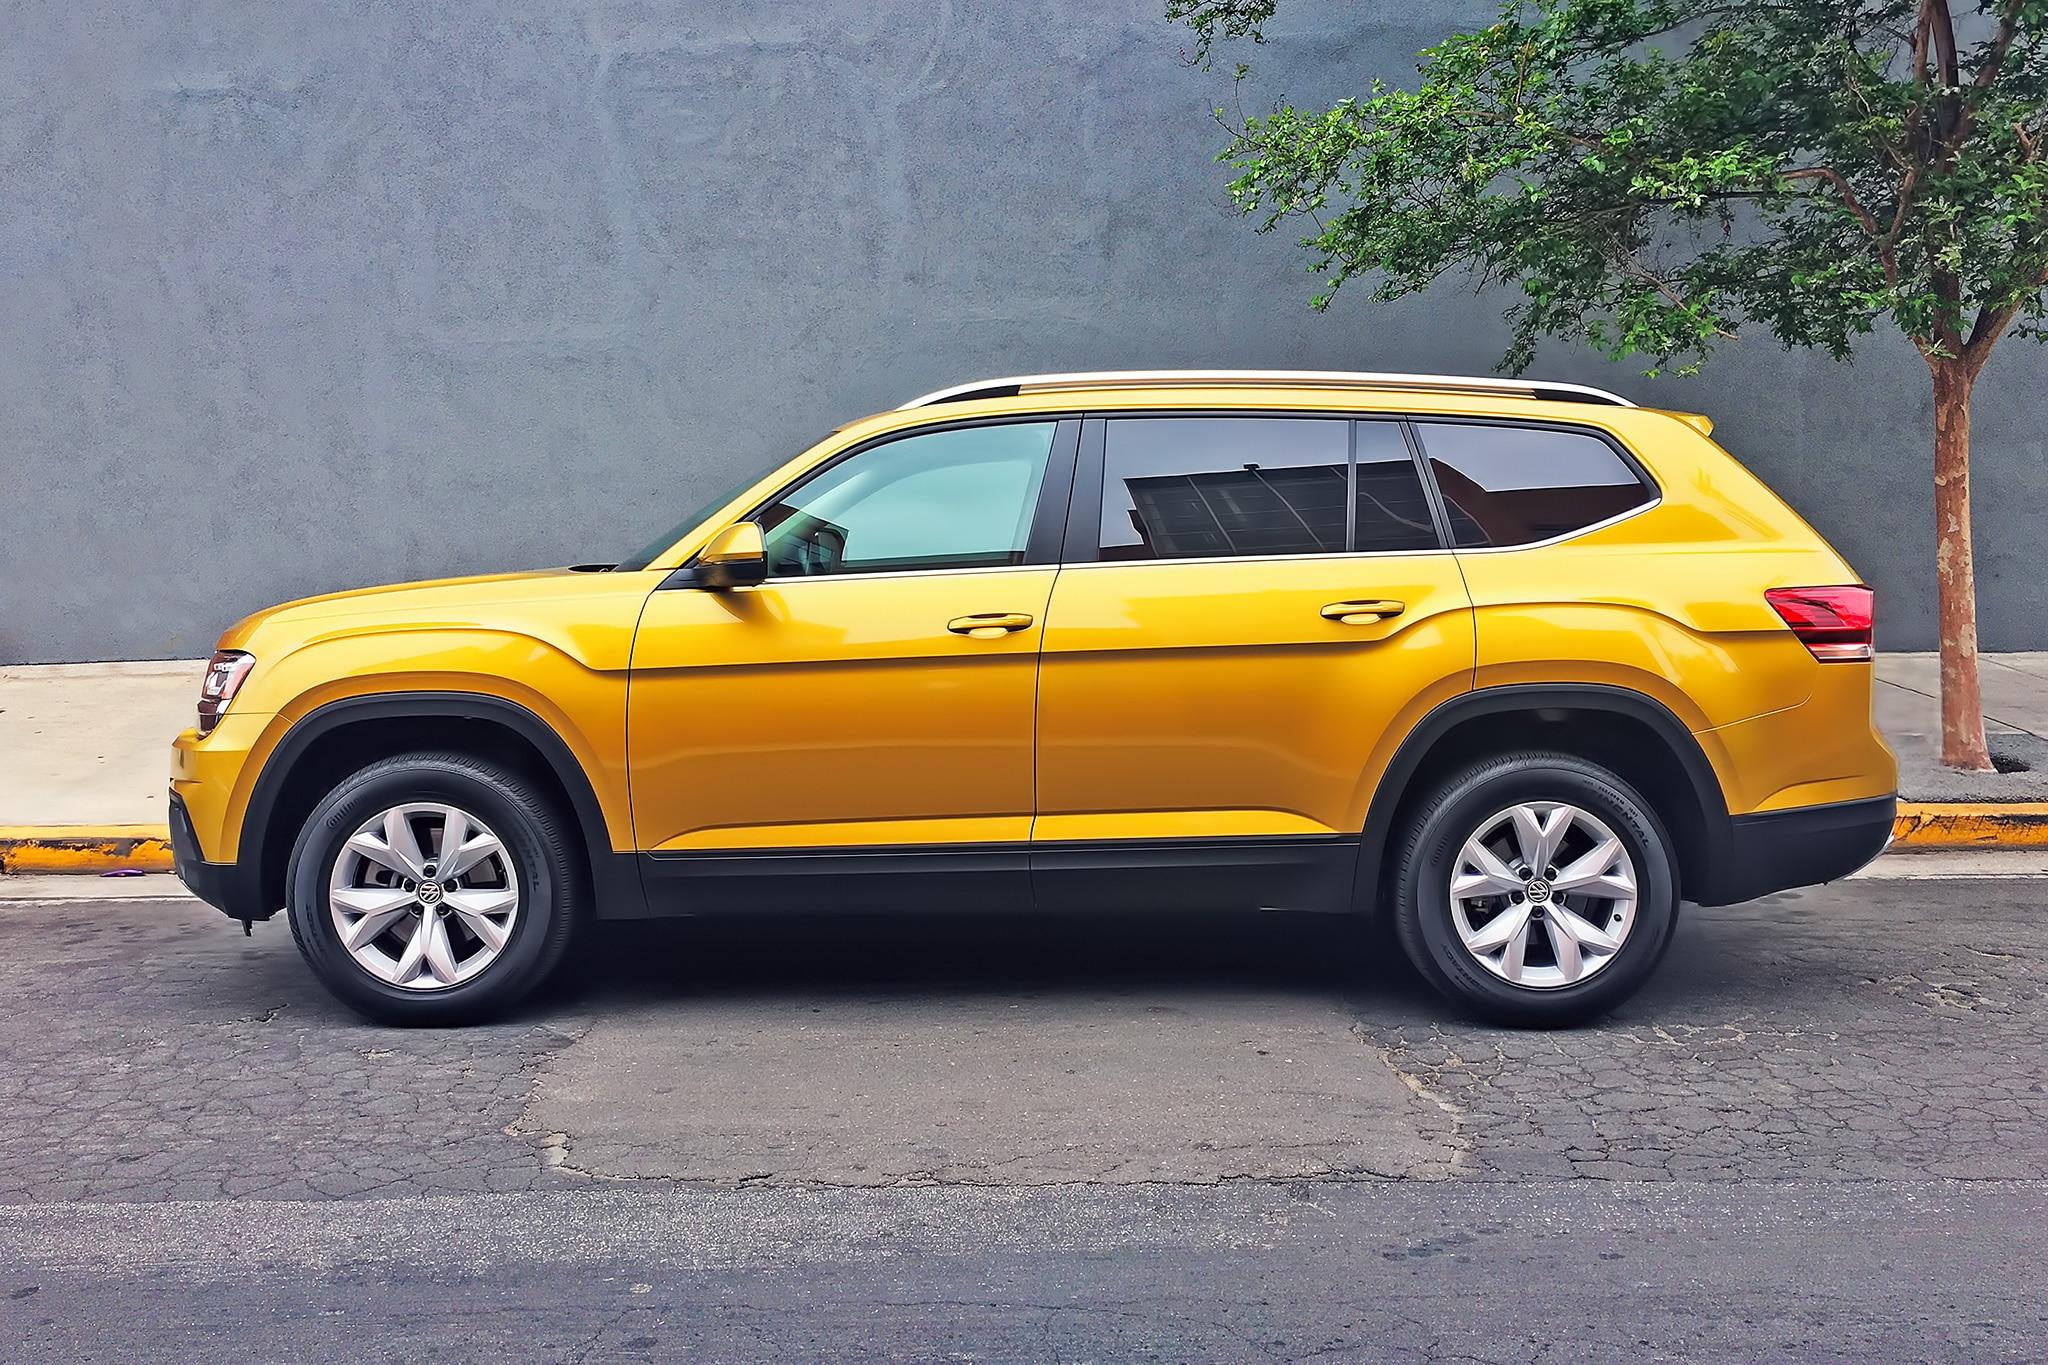 2018 Volkswagen Atlas 2 0T SE One Week Review | Automobile